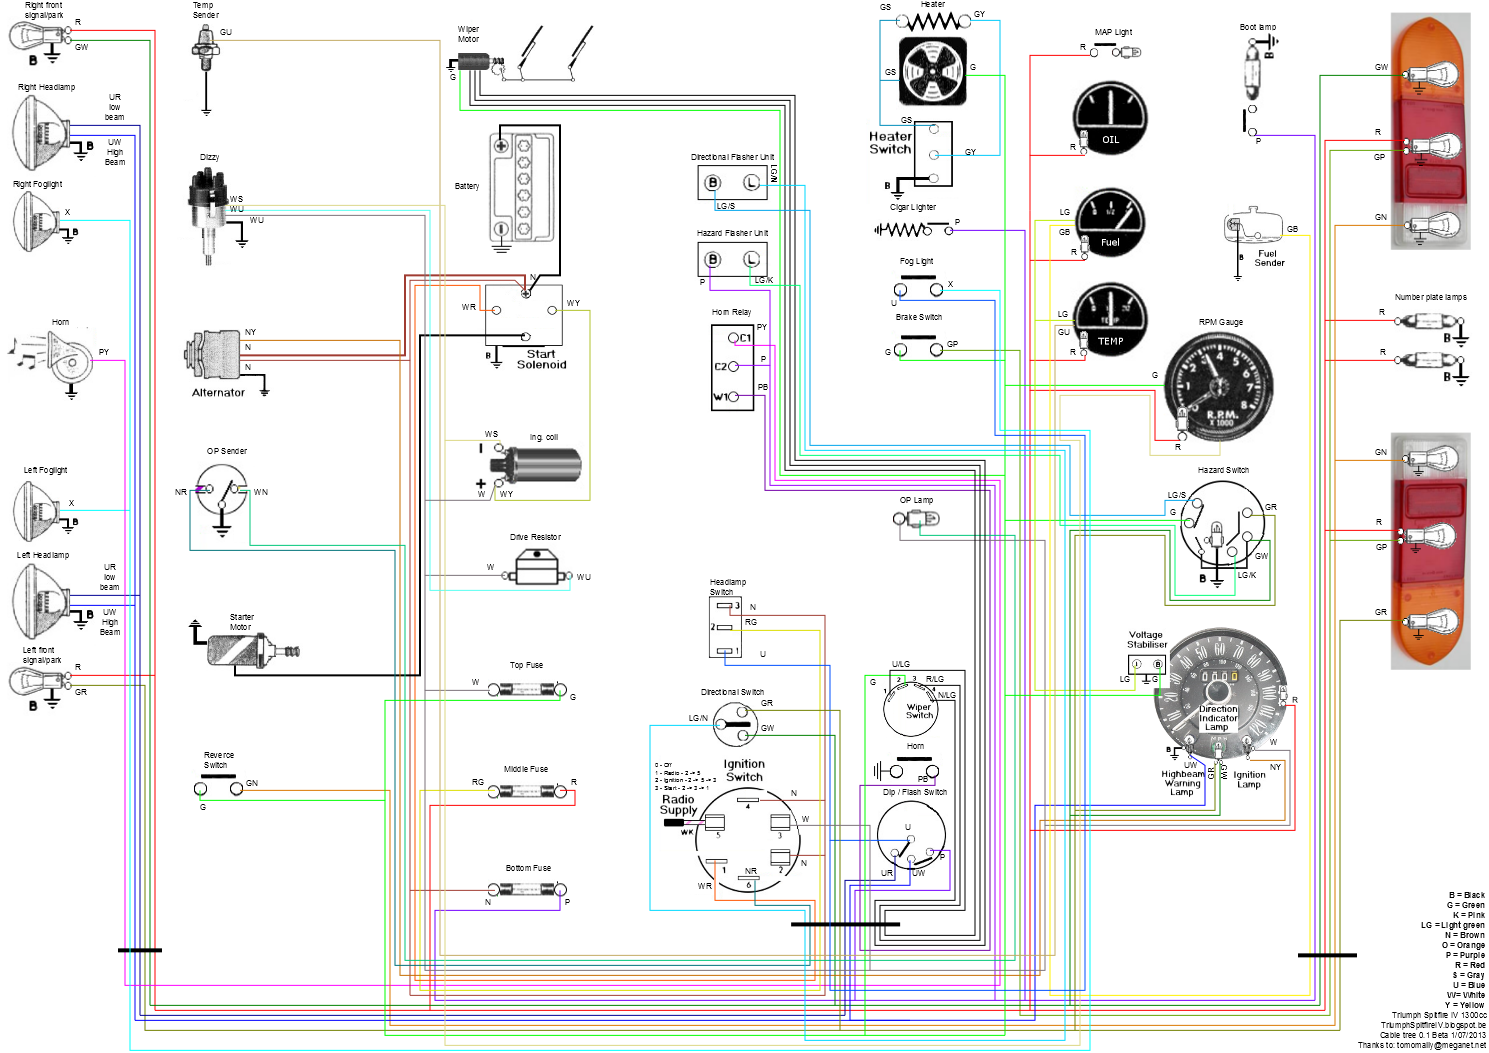 Jeep Cj5 Wiring Diagram Pdf Triumph Spitfire Blog Triumph Spitfire Electrical Wiring